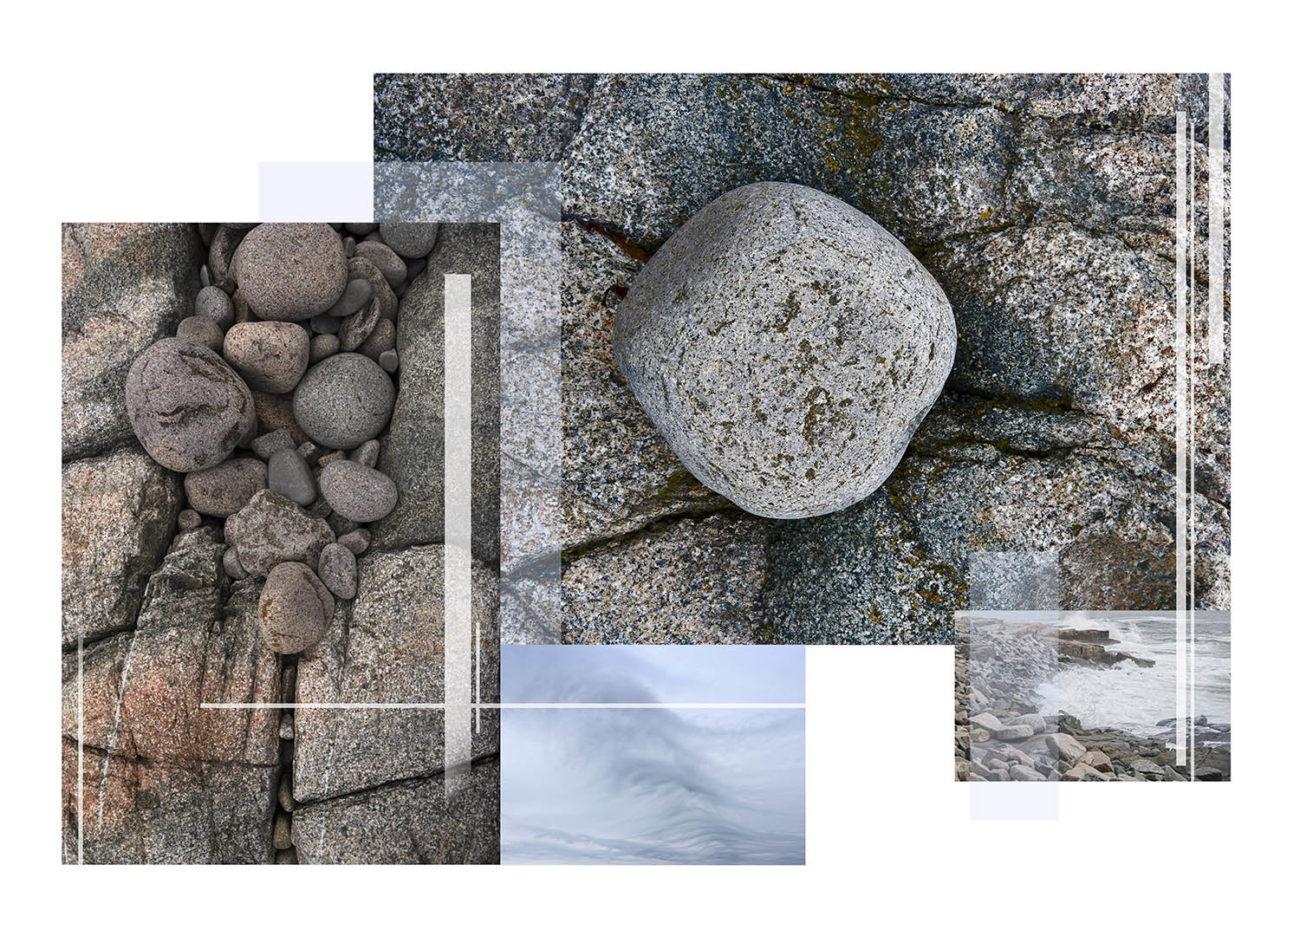 Maine coastal stones